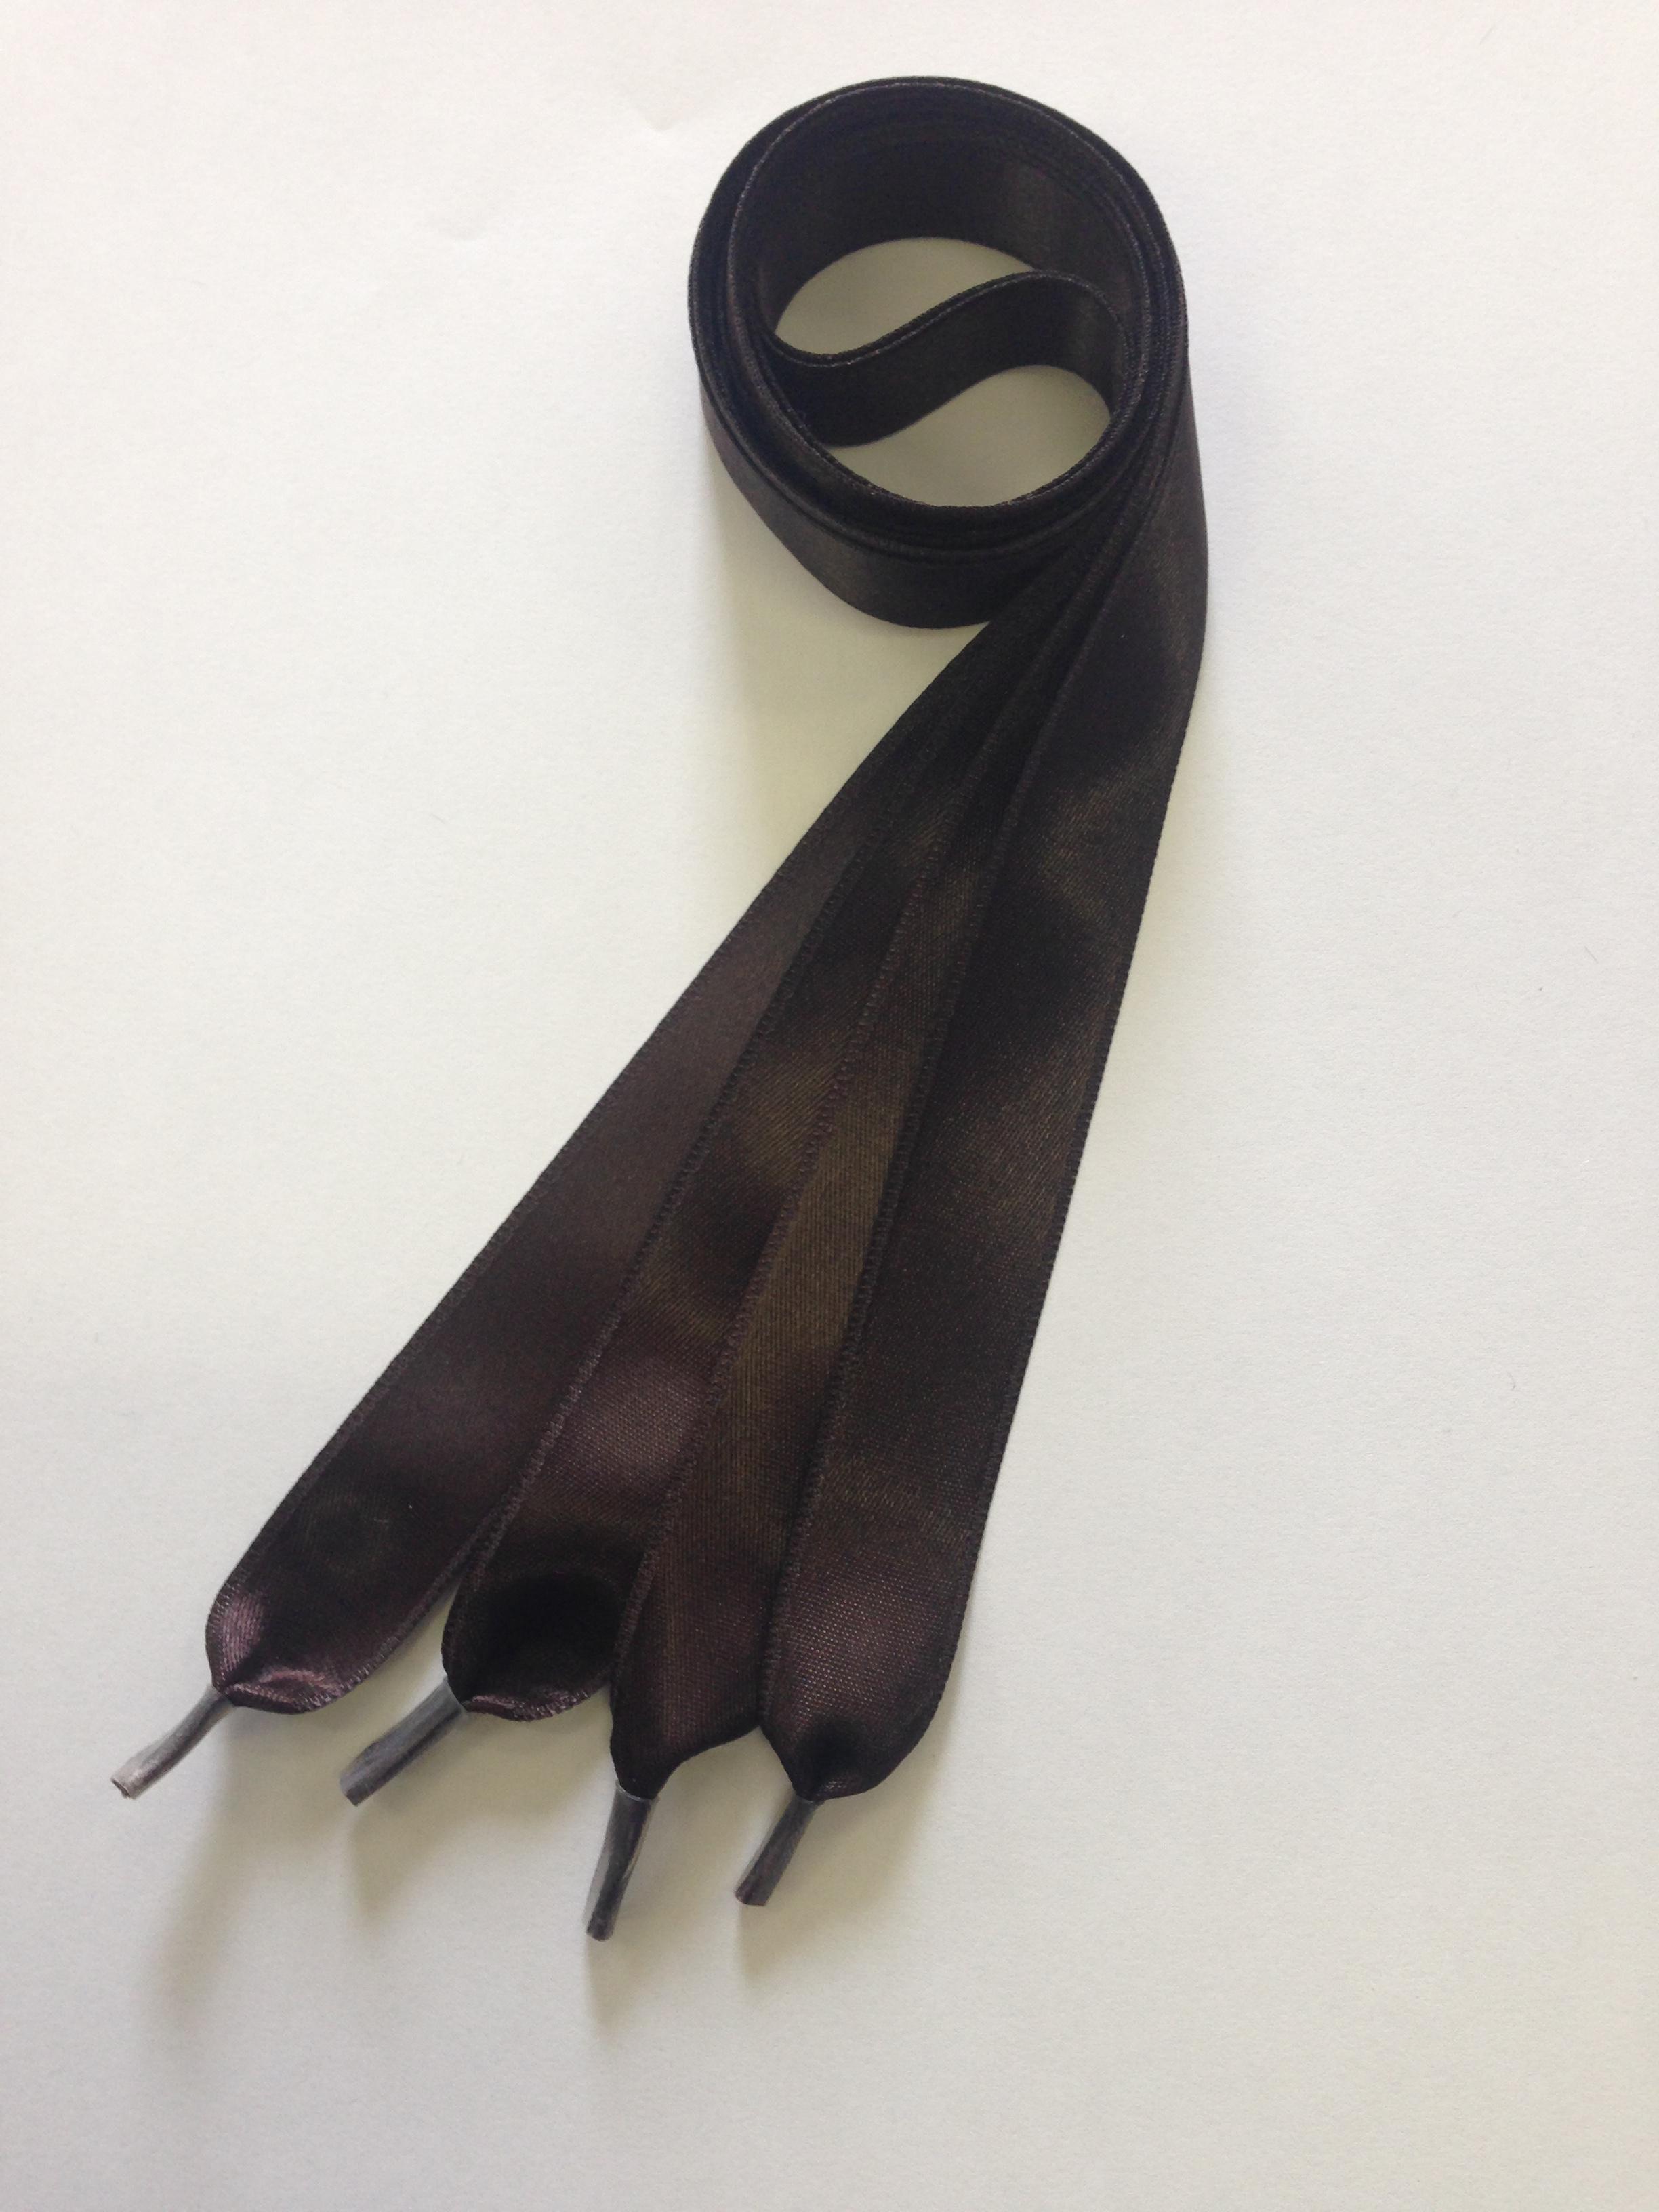 Dámske saténové šnúrky do topánok tmavo hnedé 8a6f5609d36